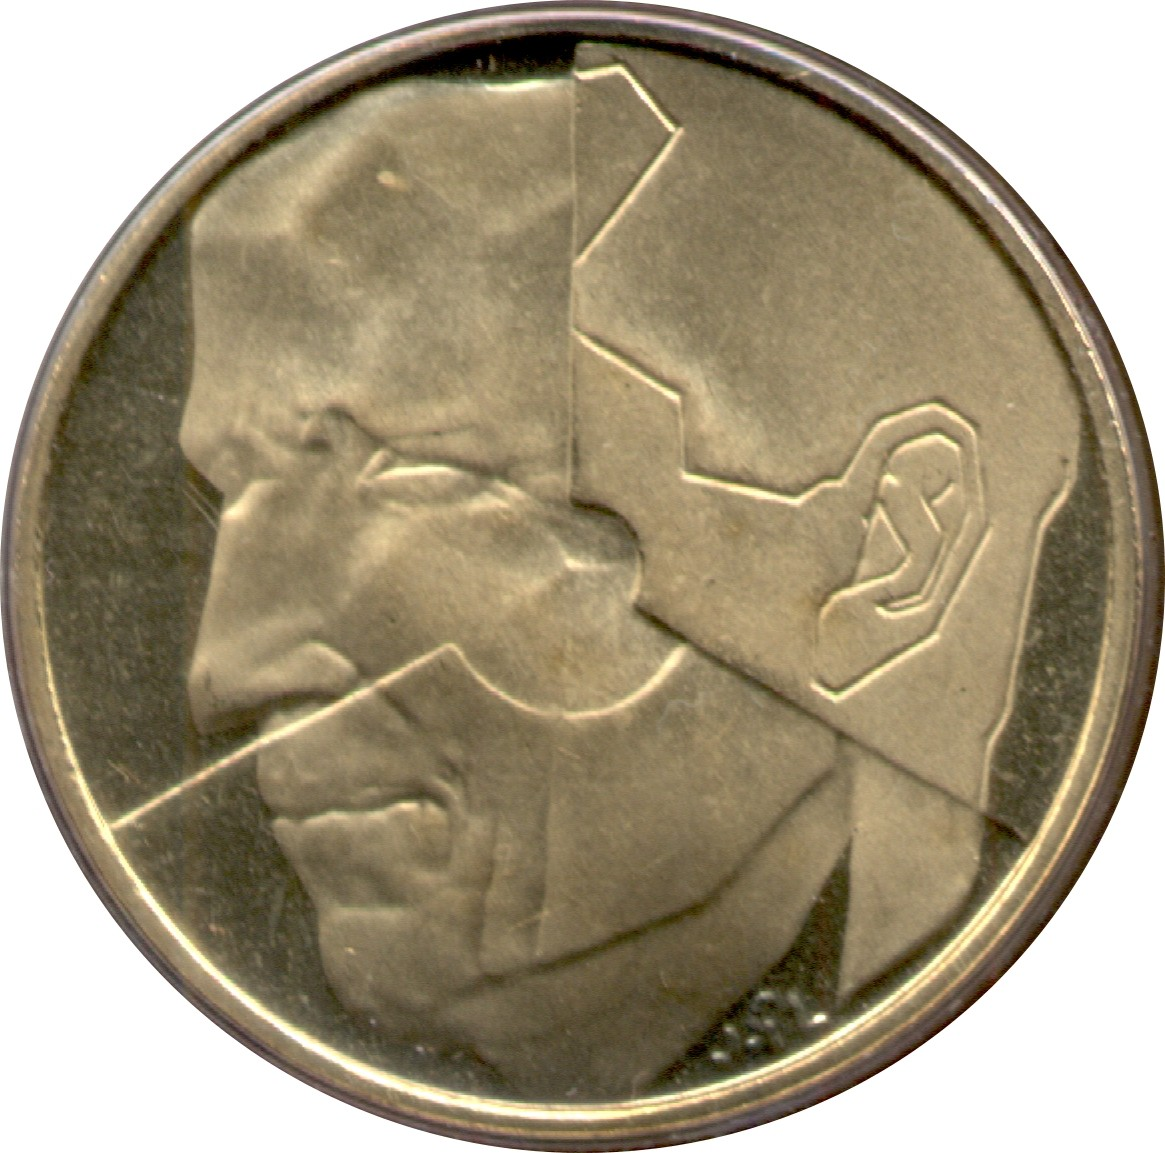 Belgium 5 Francs (1986-1993 Baudouin I)